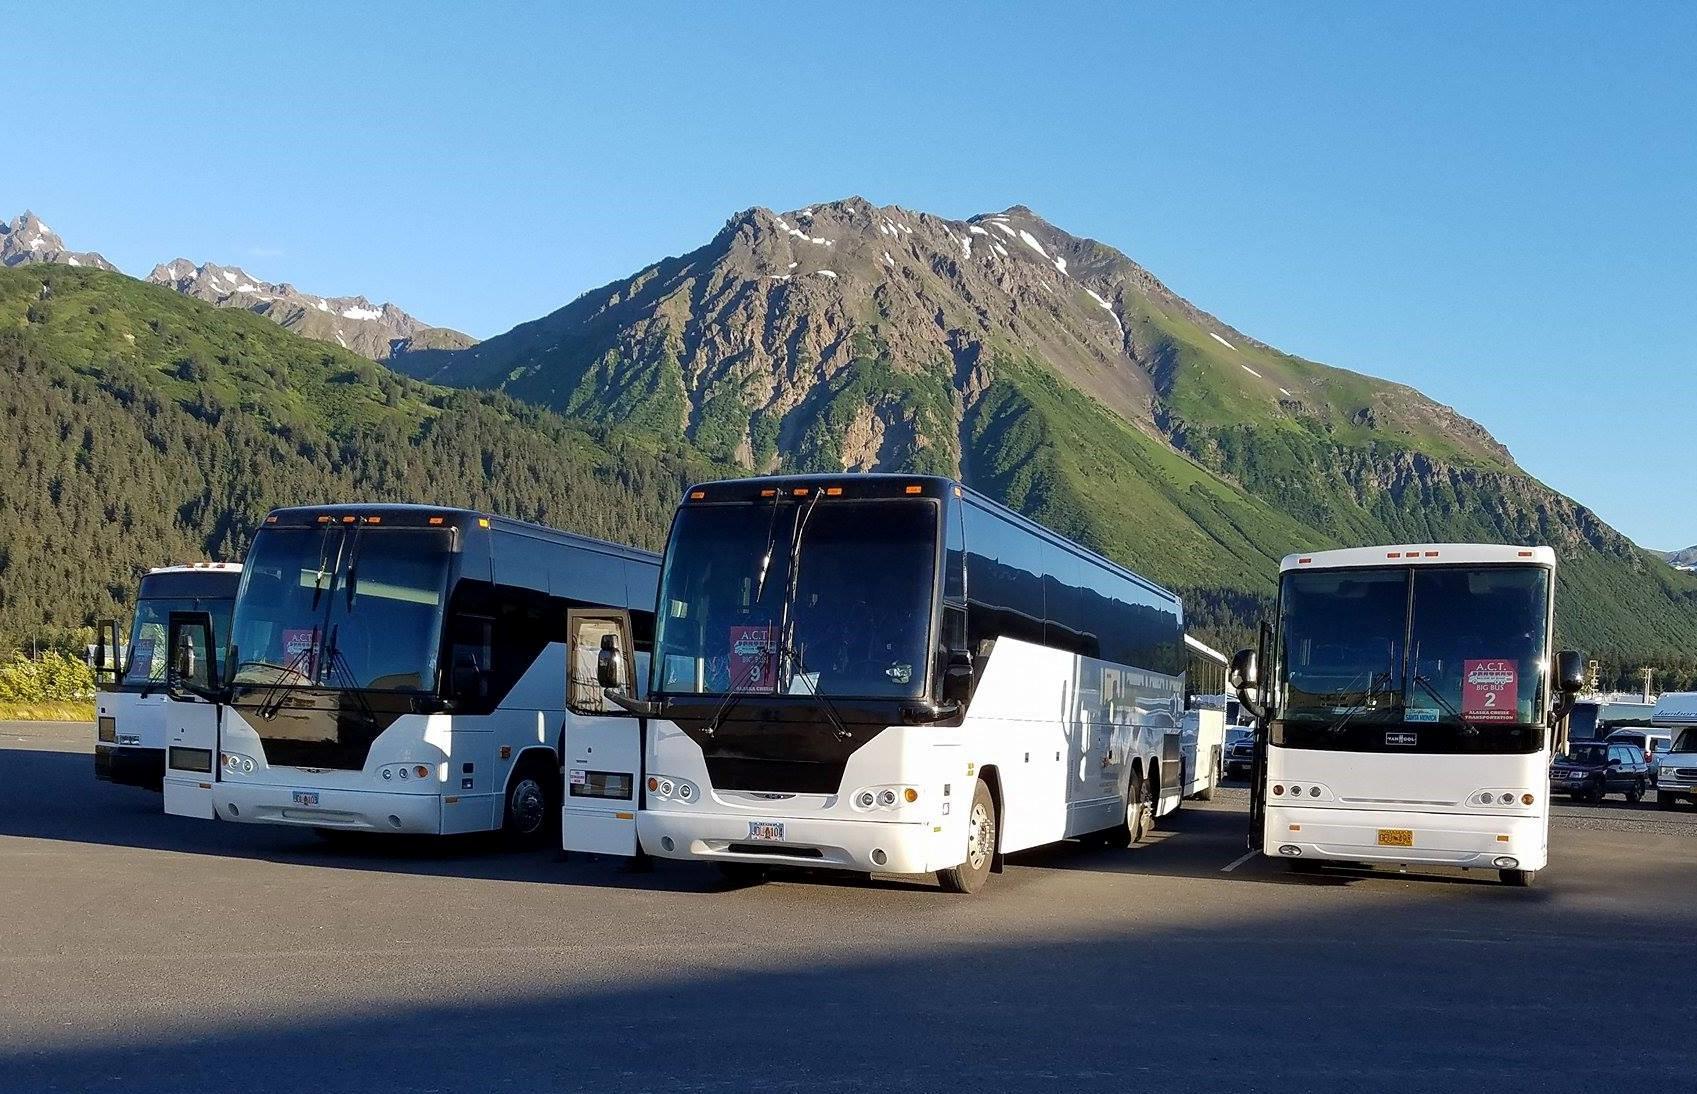 whittier shuttle bus service, alaska shuttle bus, anchorage to